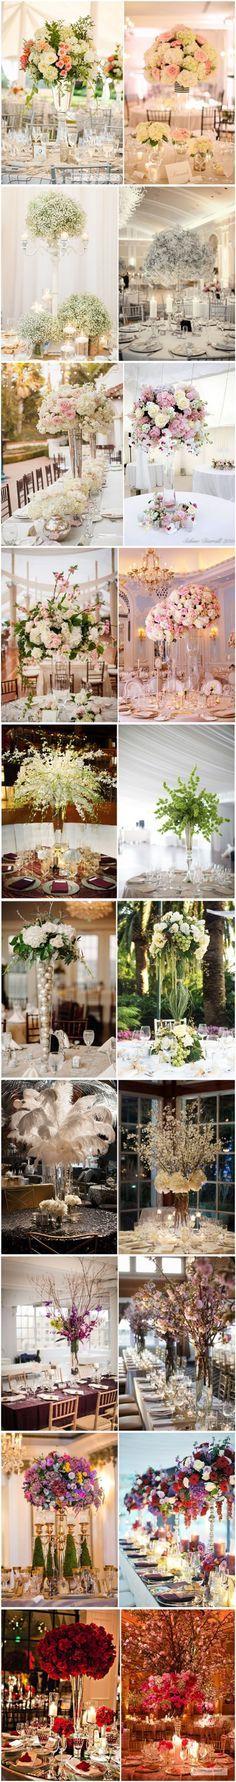 TOP 20 Tall wedding centerpiece ideas / http://www.deerpearlflowers.com/20-truly-amazing-tall-wedding-centerpiece-ideas/